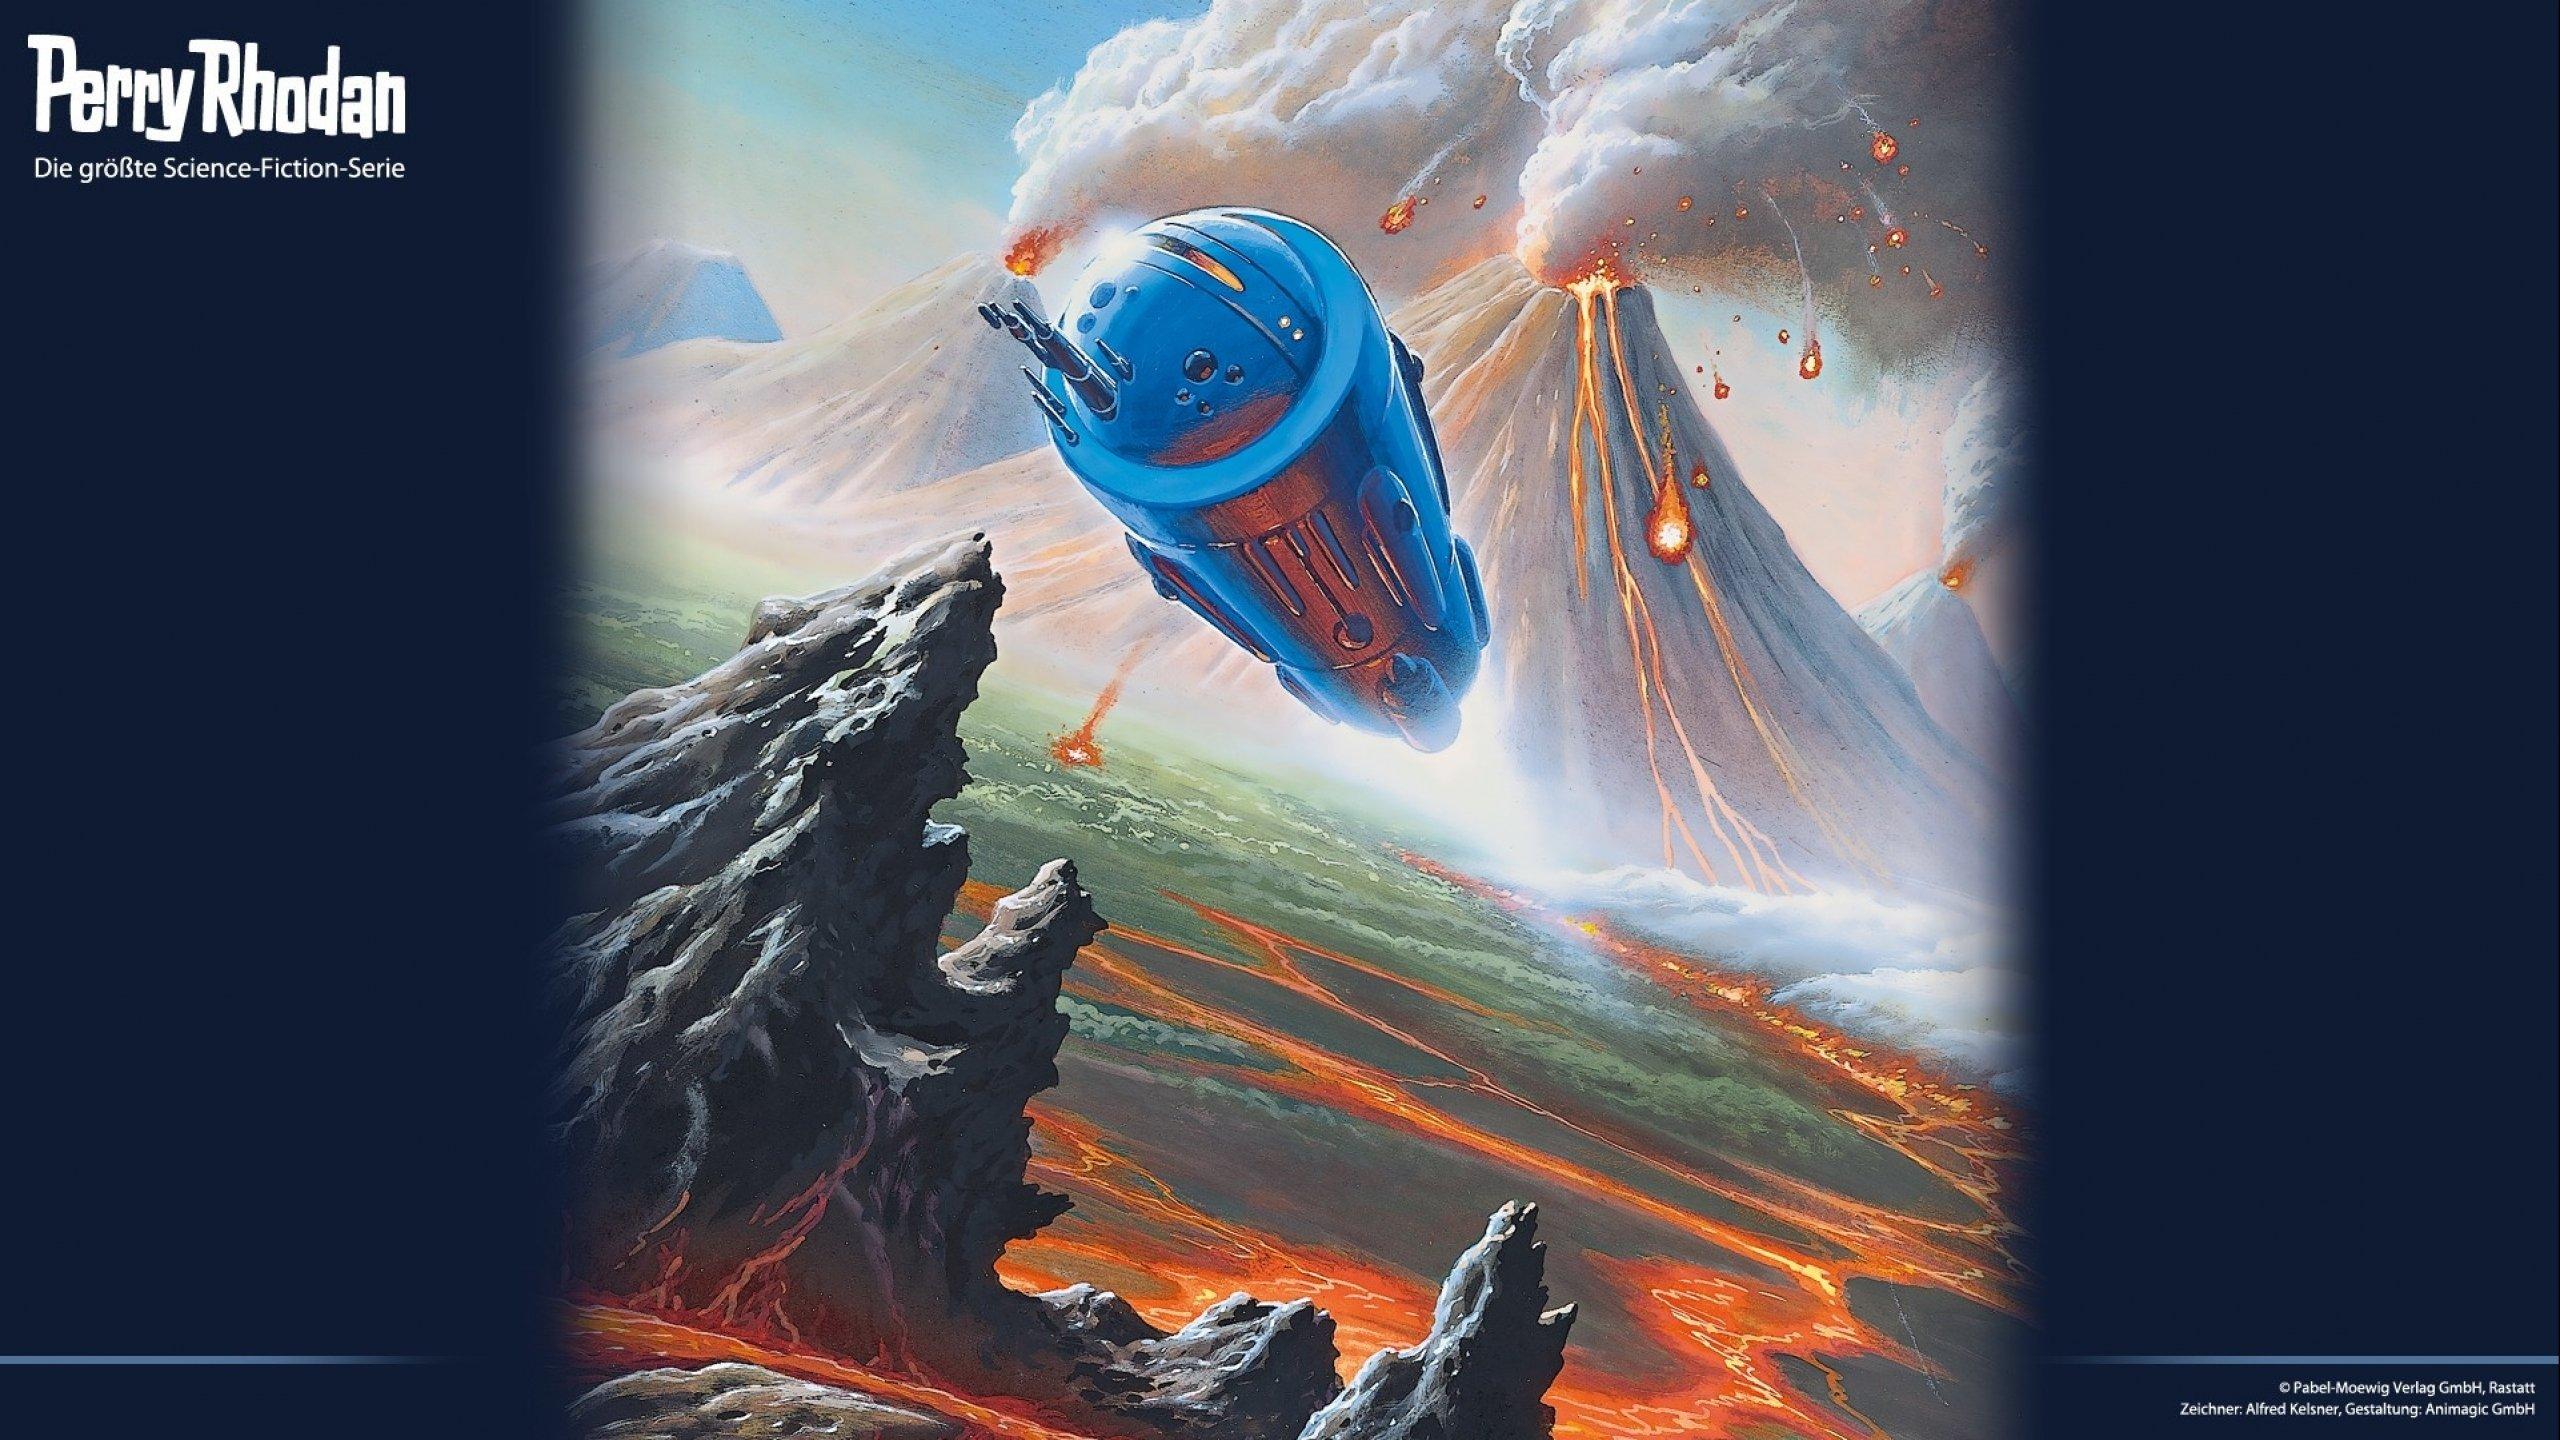 Sci Fi Wallpaper 2560x1440: PERRY RHODAN Andromeda Art Artwork Sci-fi Futuristic